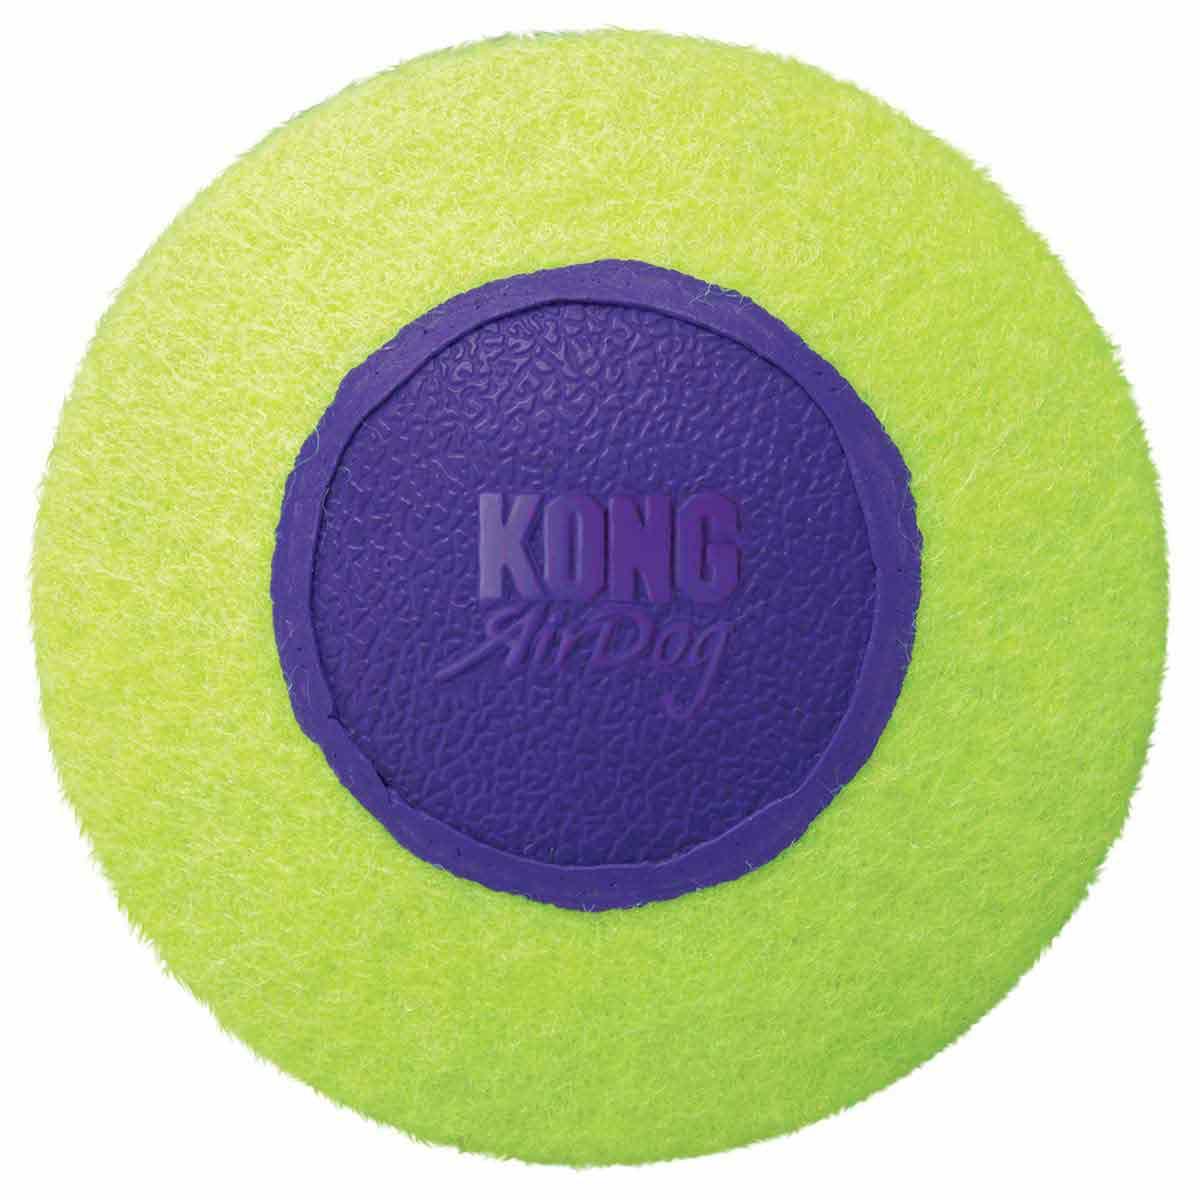 Kong AirDog Disc Large available at Ryan's Pet Supplies